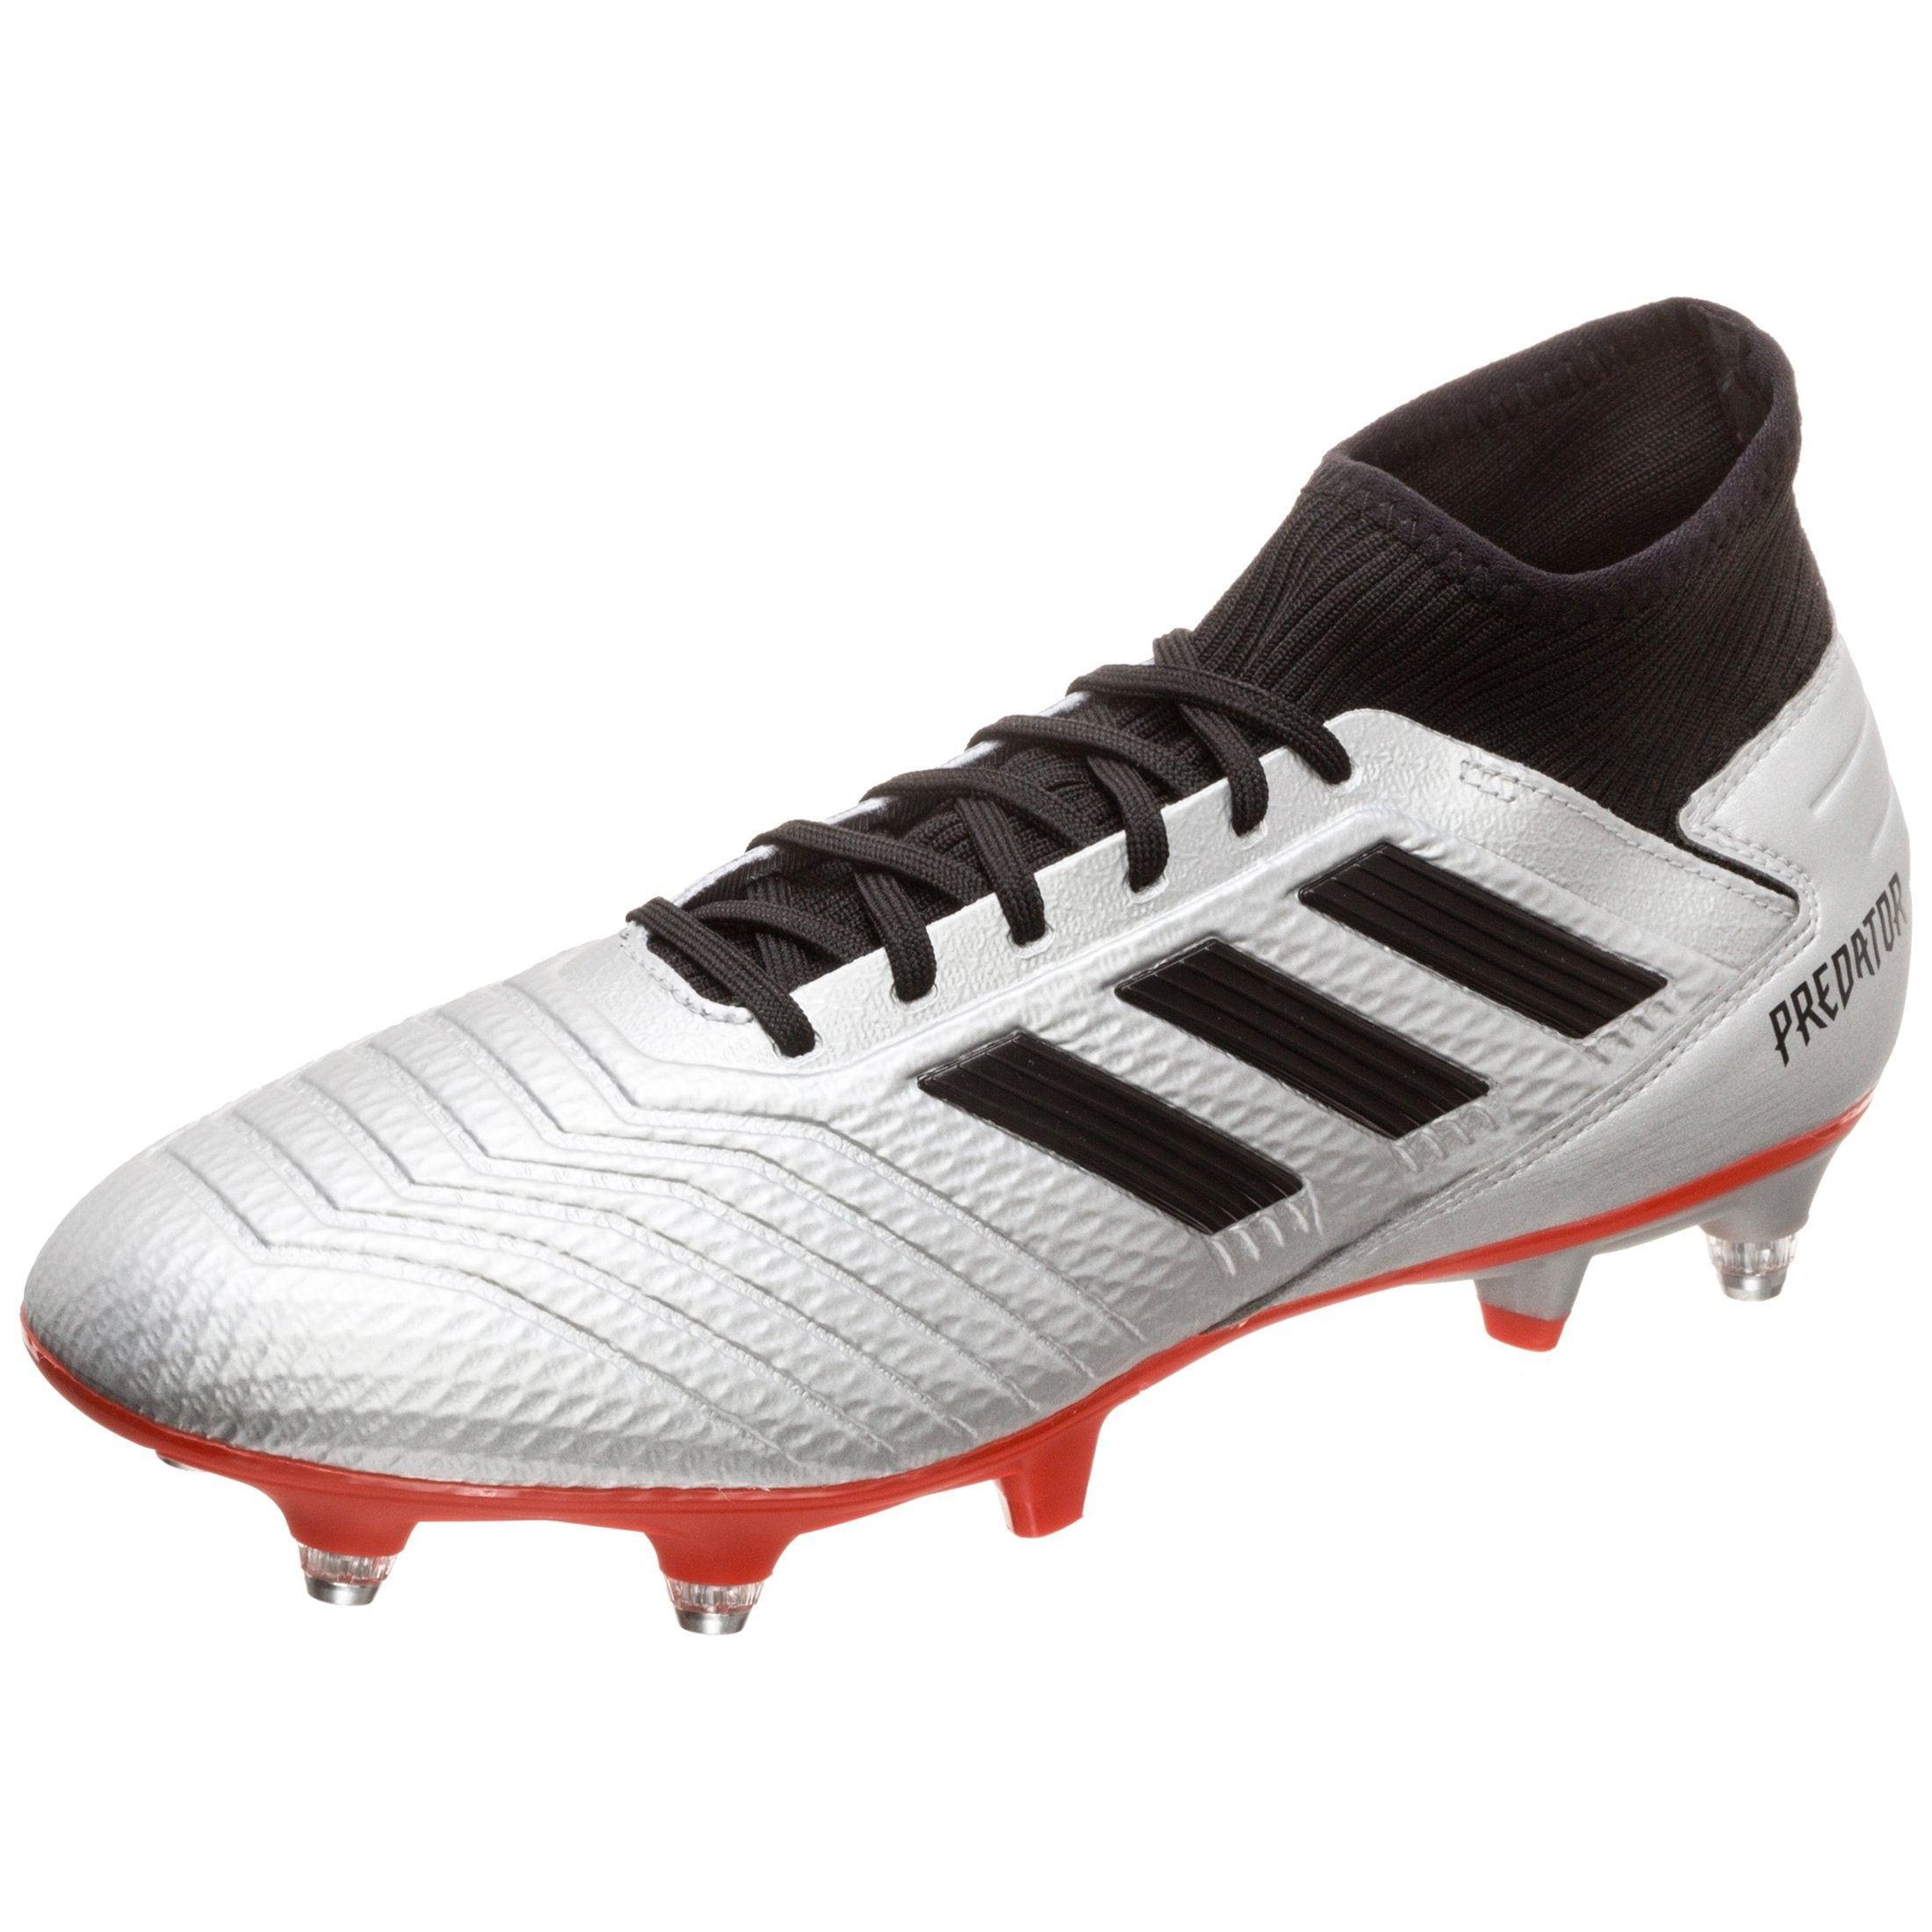 adidas Performance Fußballschuh Predator 193 | Schuhe > Sportschuhe > Fußballschuhe | Adidas Performance